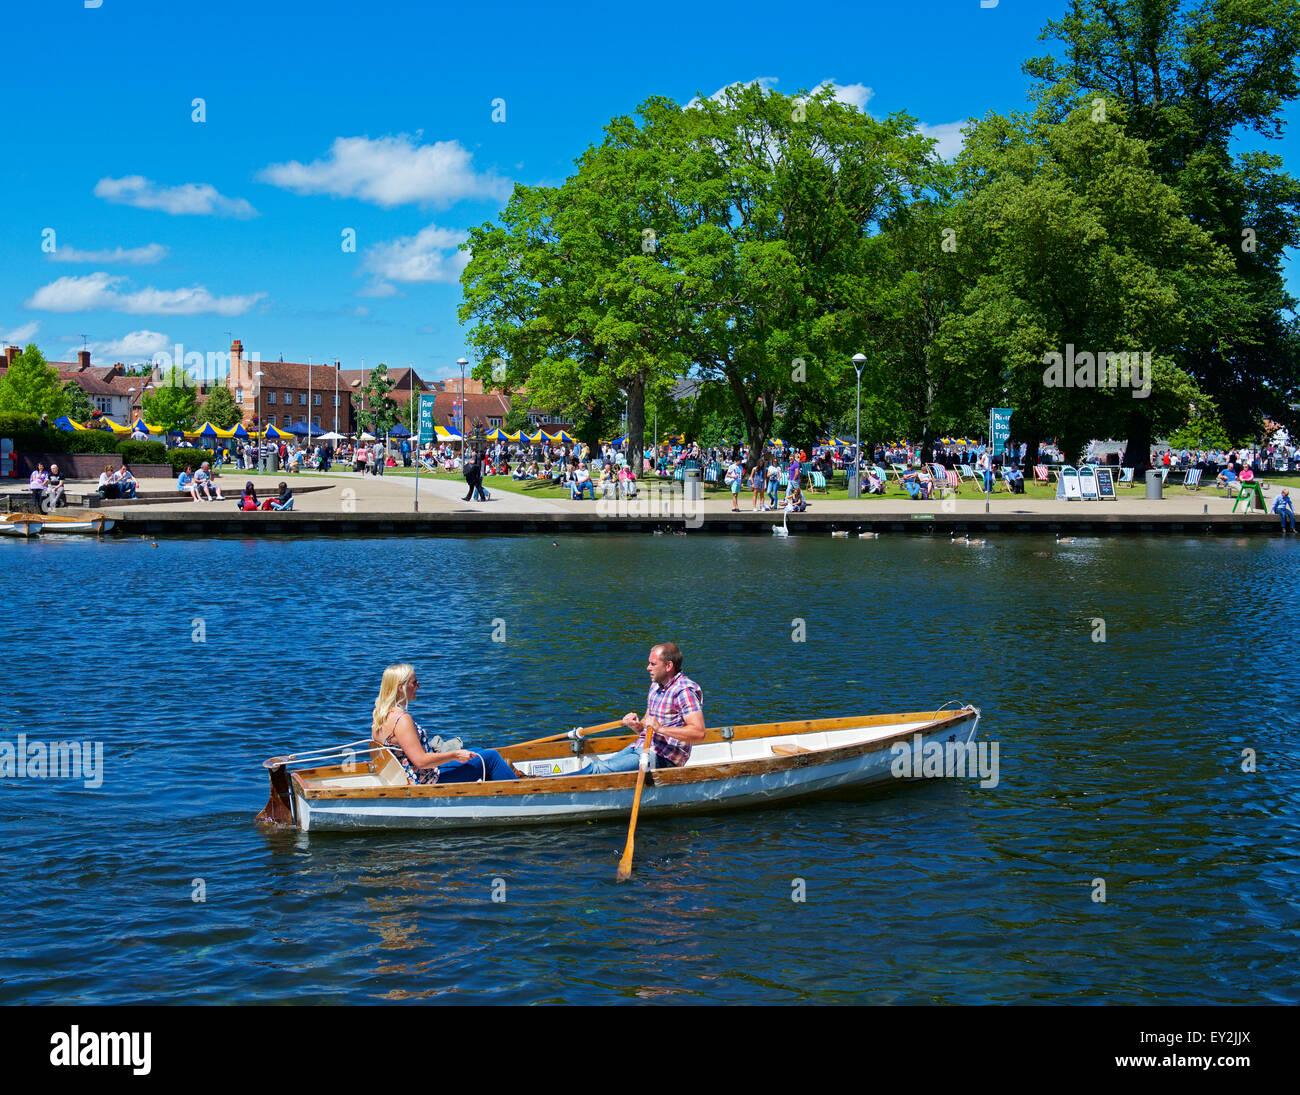 Couple in rowing boat on River Avon, Stratford upon Avon, Warwickshire, England UK - Stock Image